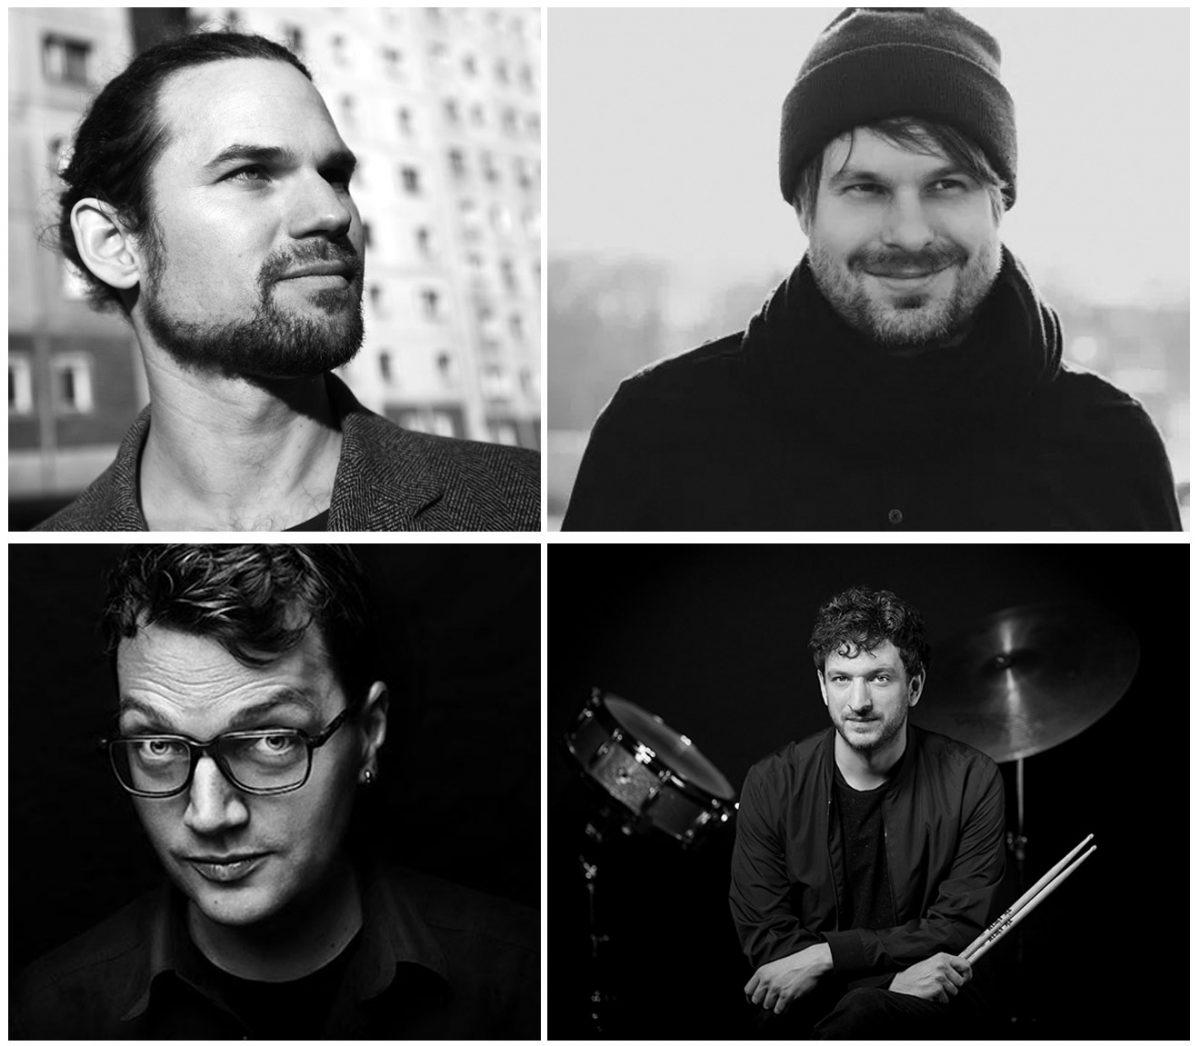 Rainer Böhm Quartet, Rainer Böhm, Wanja Slavin, Arne Huber, Peter Gall, LOFT, Köln, Cologne